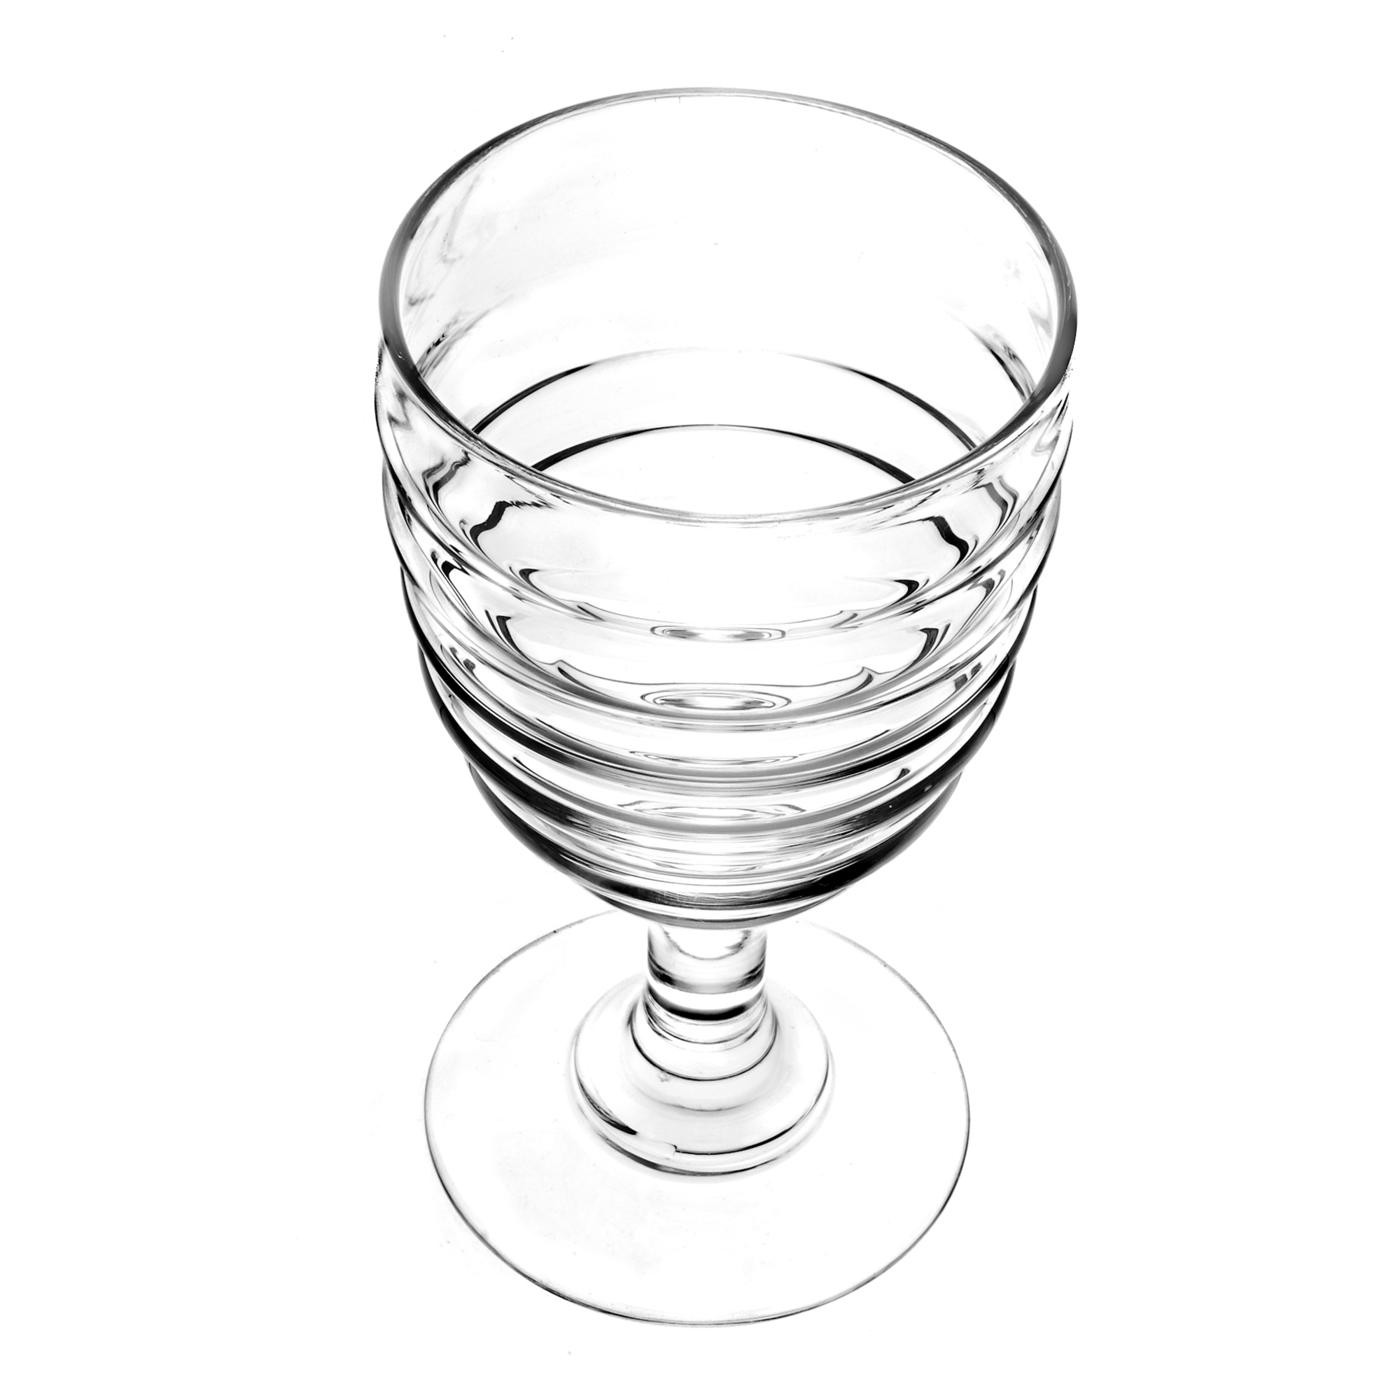 1400x1400 Sophie Conran For Portmeirion Wine Glass (Set Of 2)